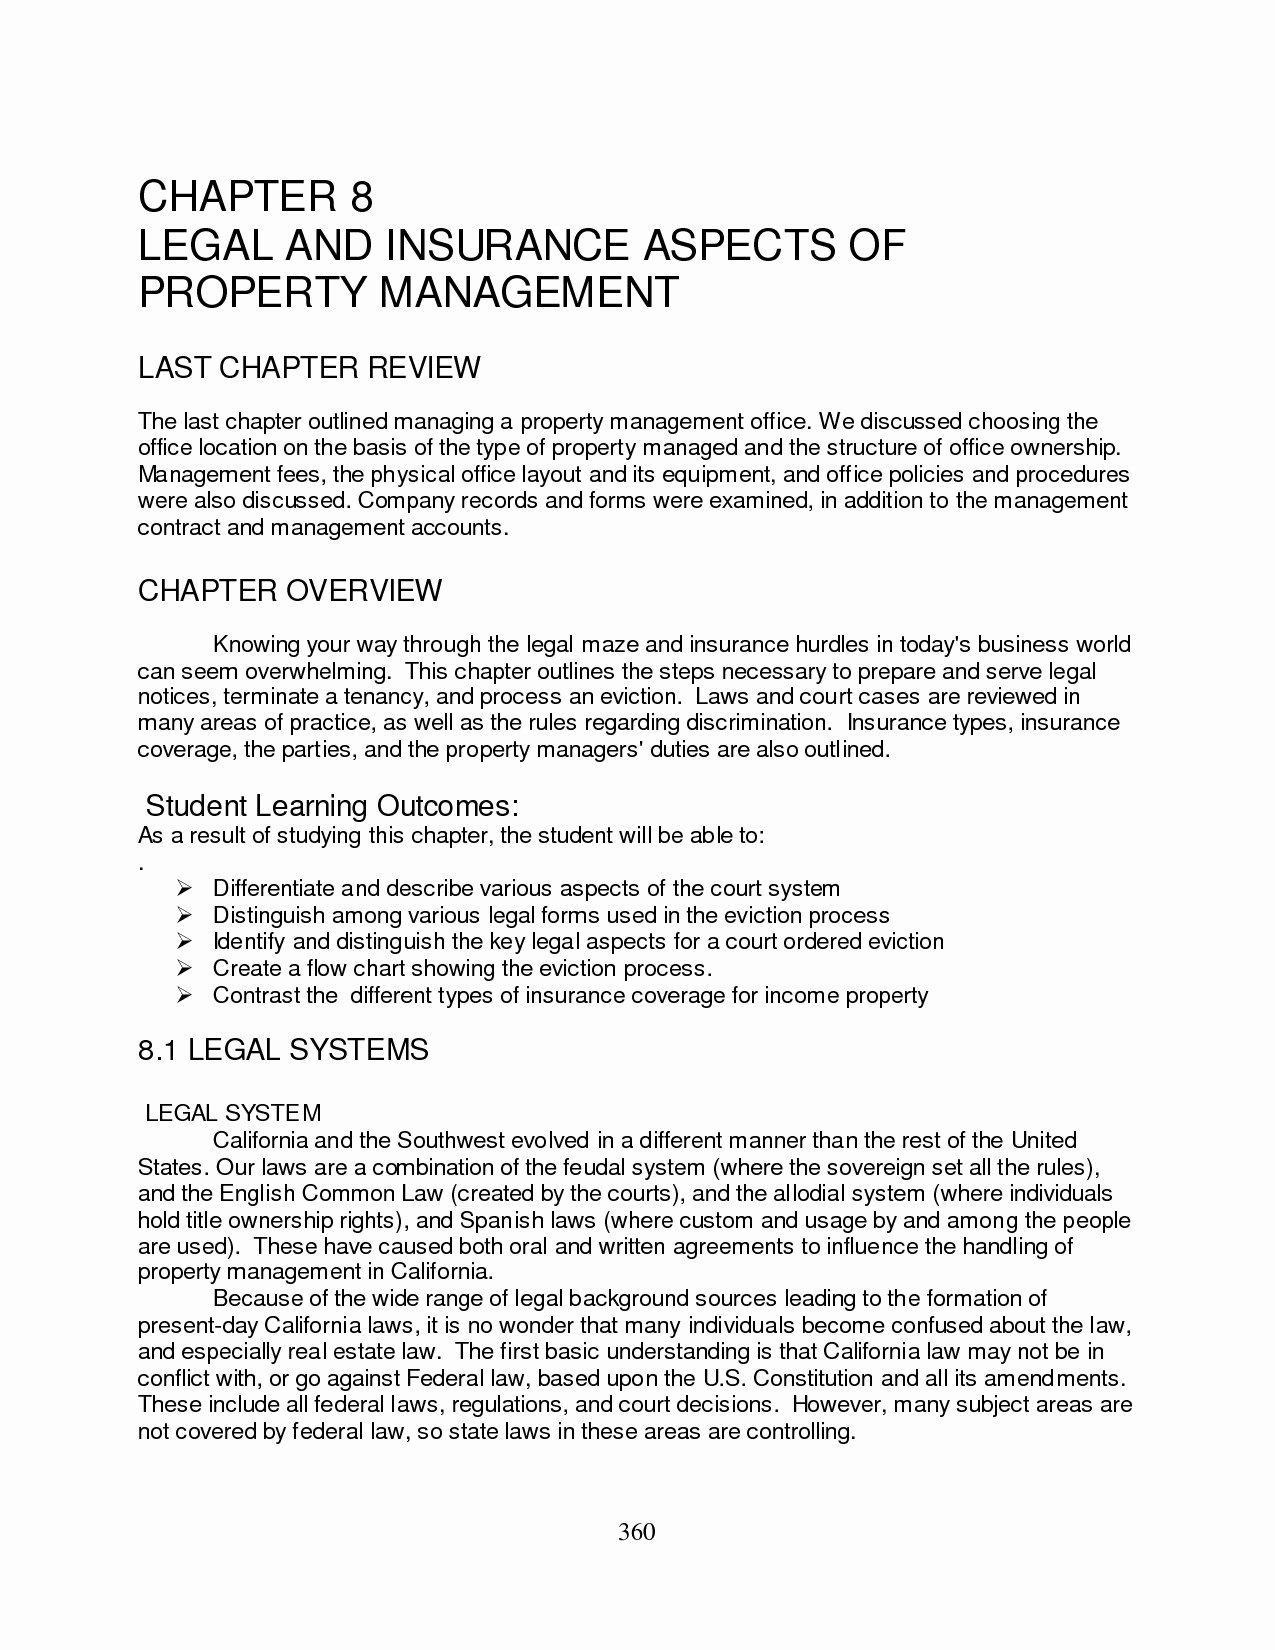 Complaint Letter to Landlord Elegant Sample Plaint Letter to Landlord About Neighbor Noise